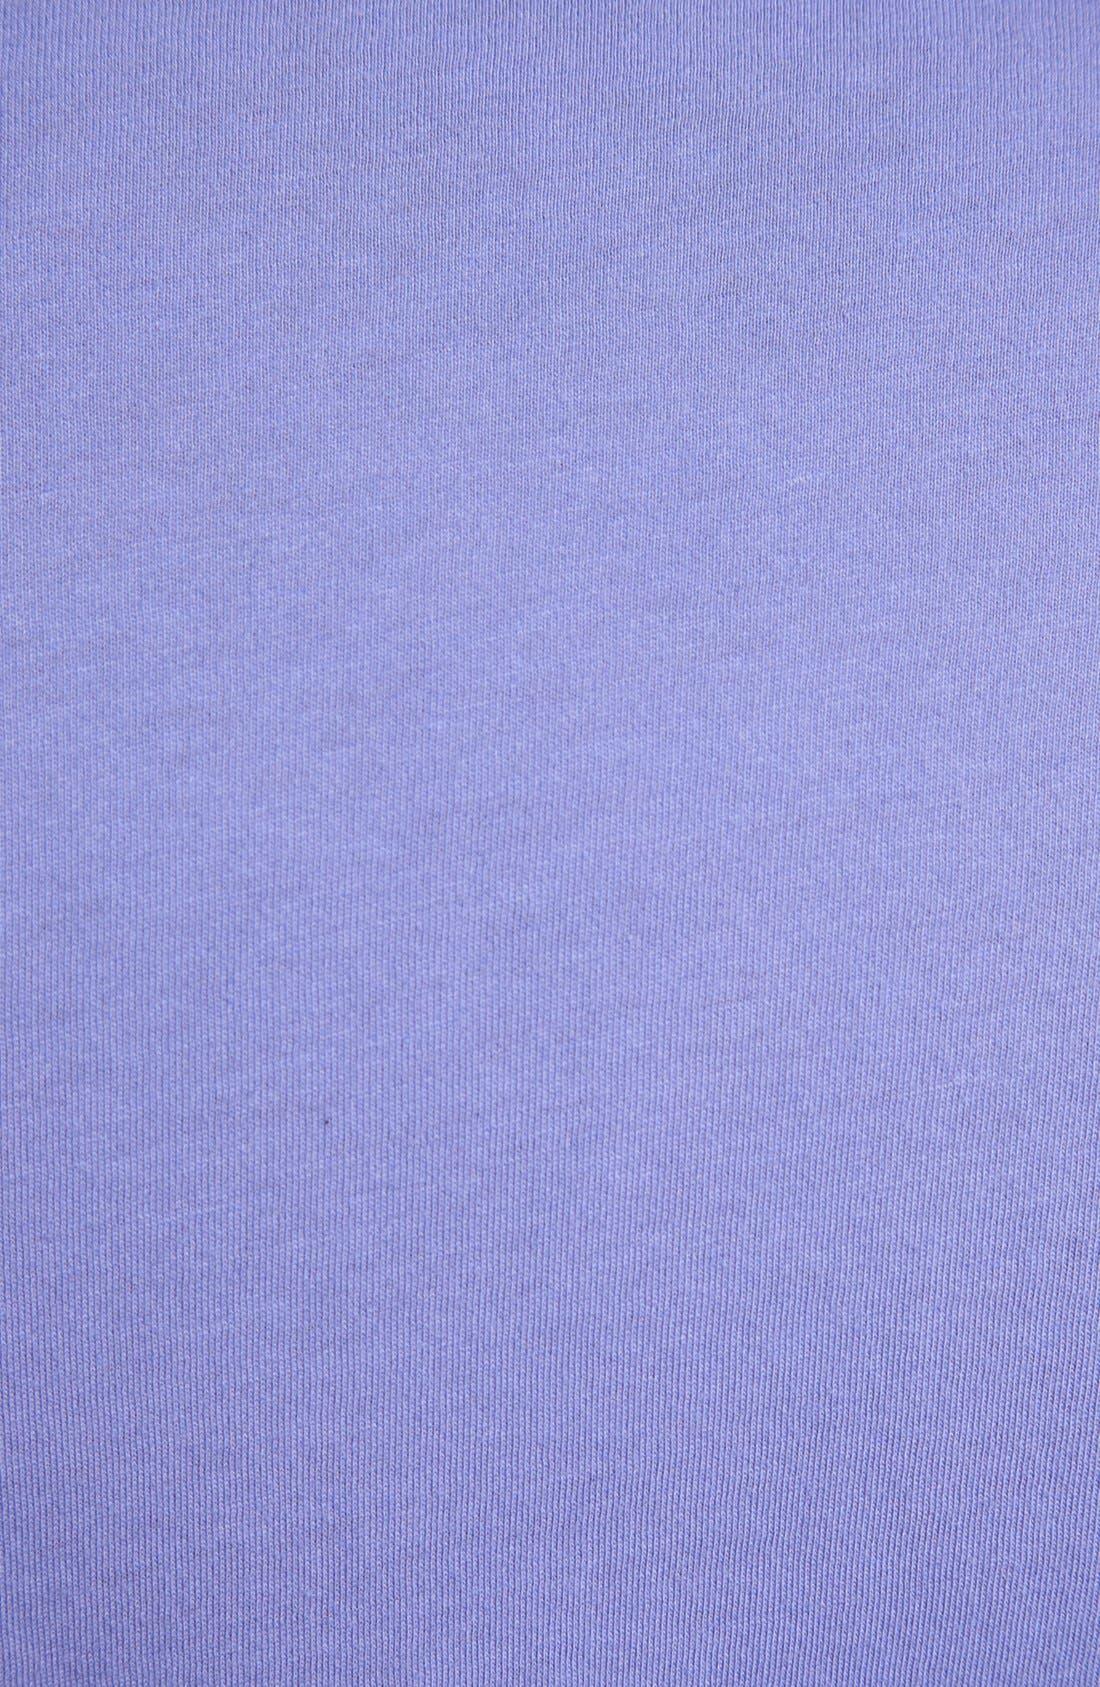 Alternate Image 3  - Topo Ranch 'Topo Tribe' T-Shirt